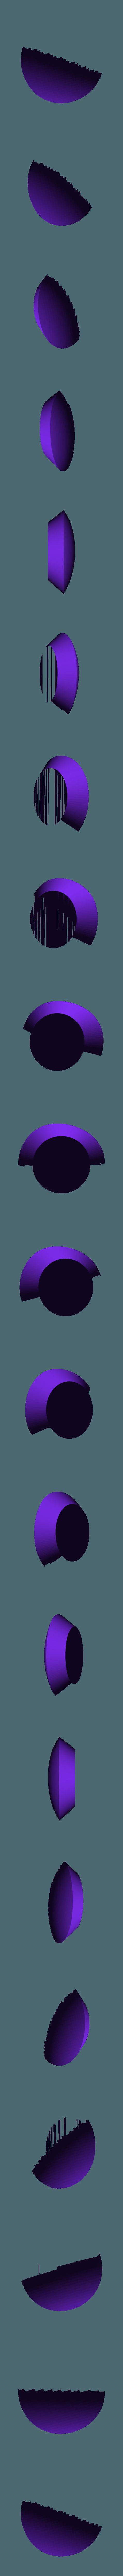 hat spot side x 4.stl Download free STL file Toadette from Mario games - Multi-color • 3D printing design, bpitanga